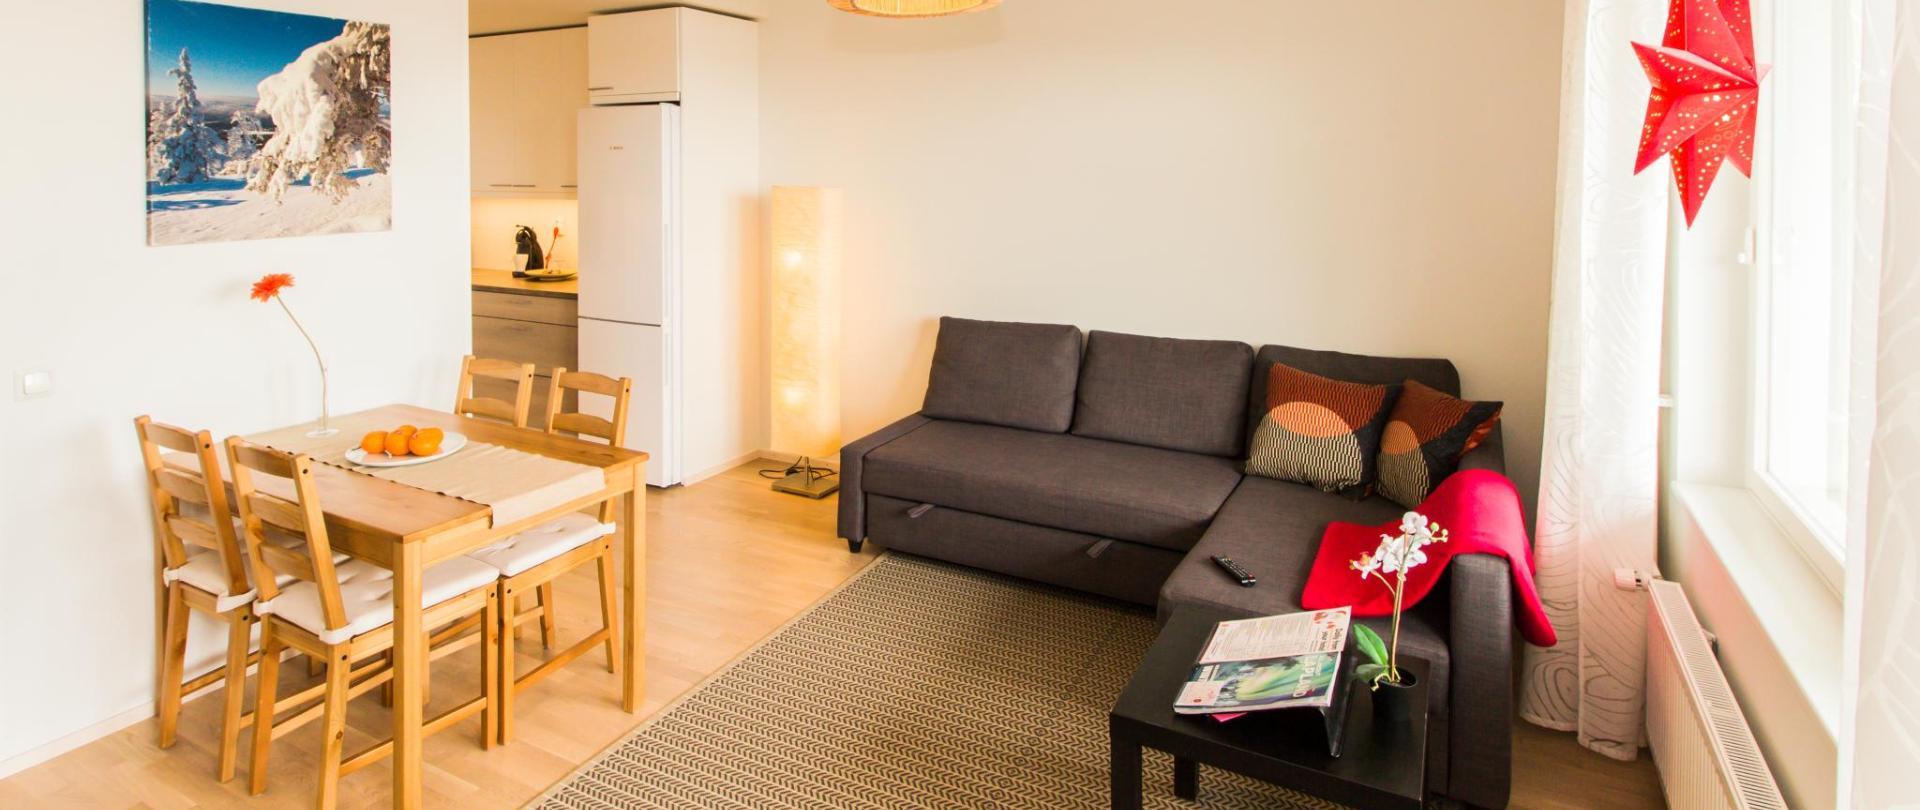 Helppo Hotelli Apartments Rovaniemi